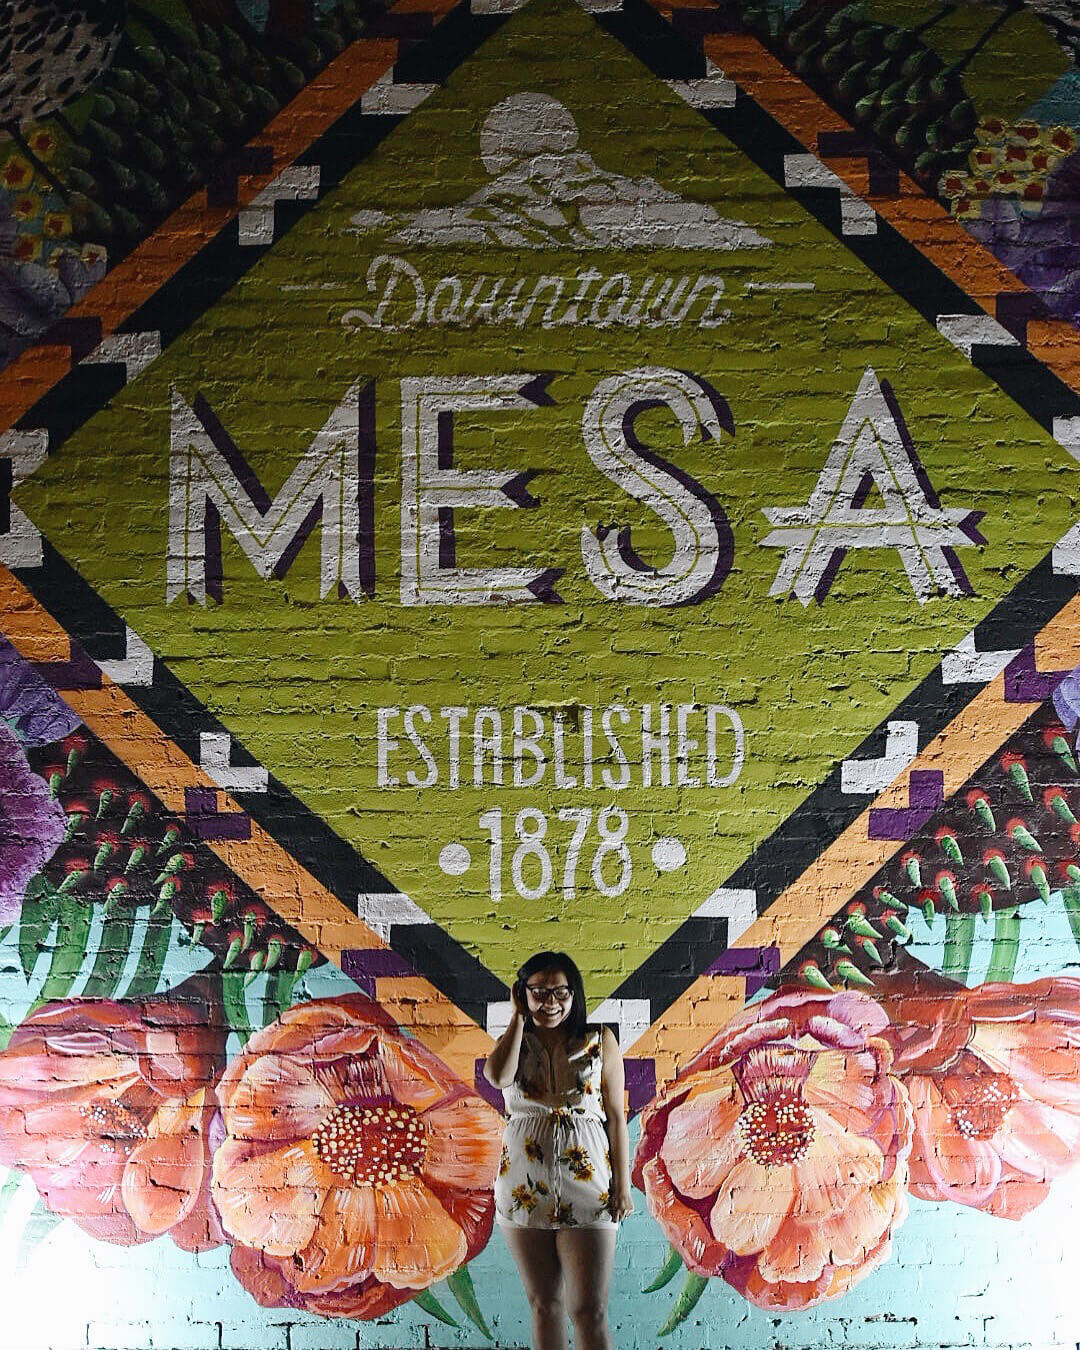 Instagrammable Walls of Mesa Arizona Murals Travel Visit Downtown